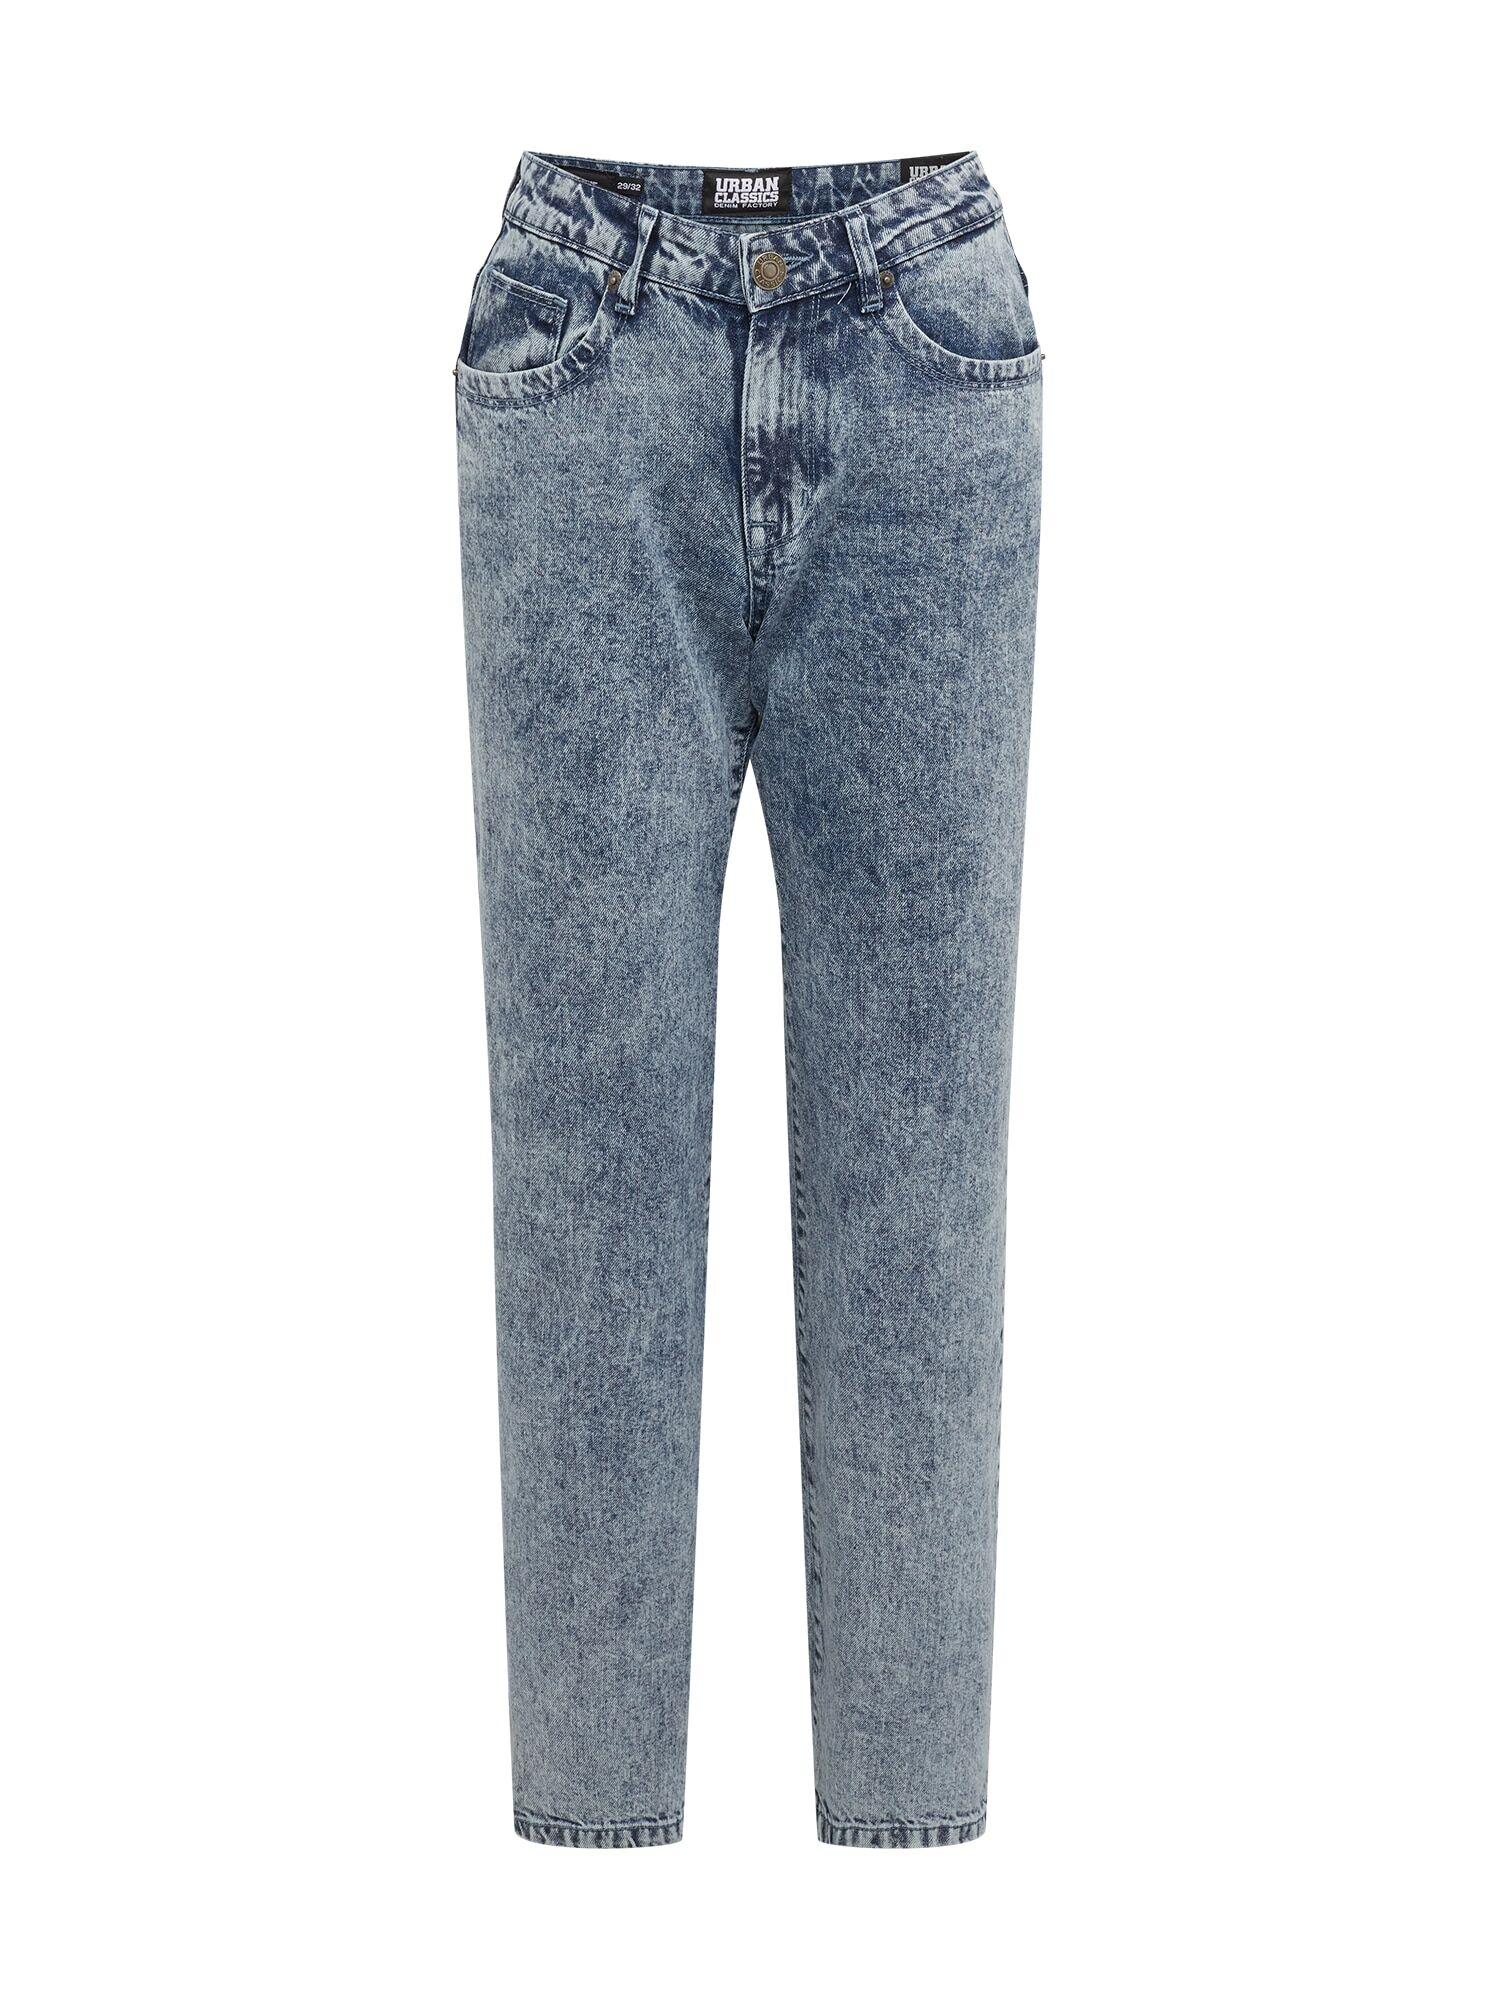 Urban Classics Jean  - Bleu - Taille: 36 - male